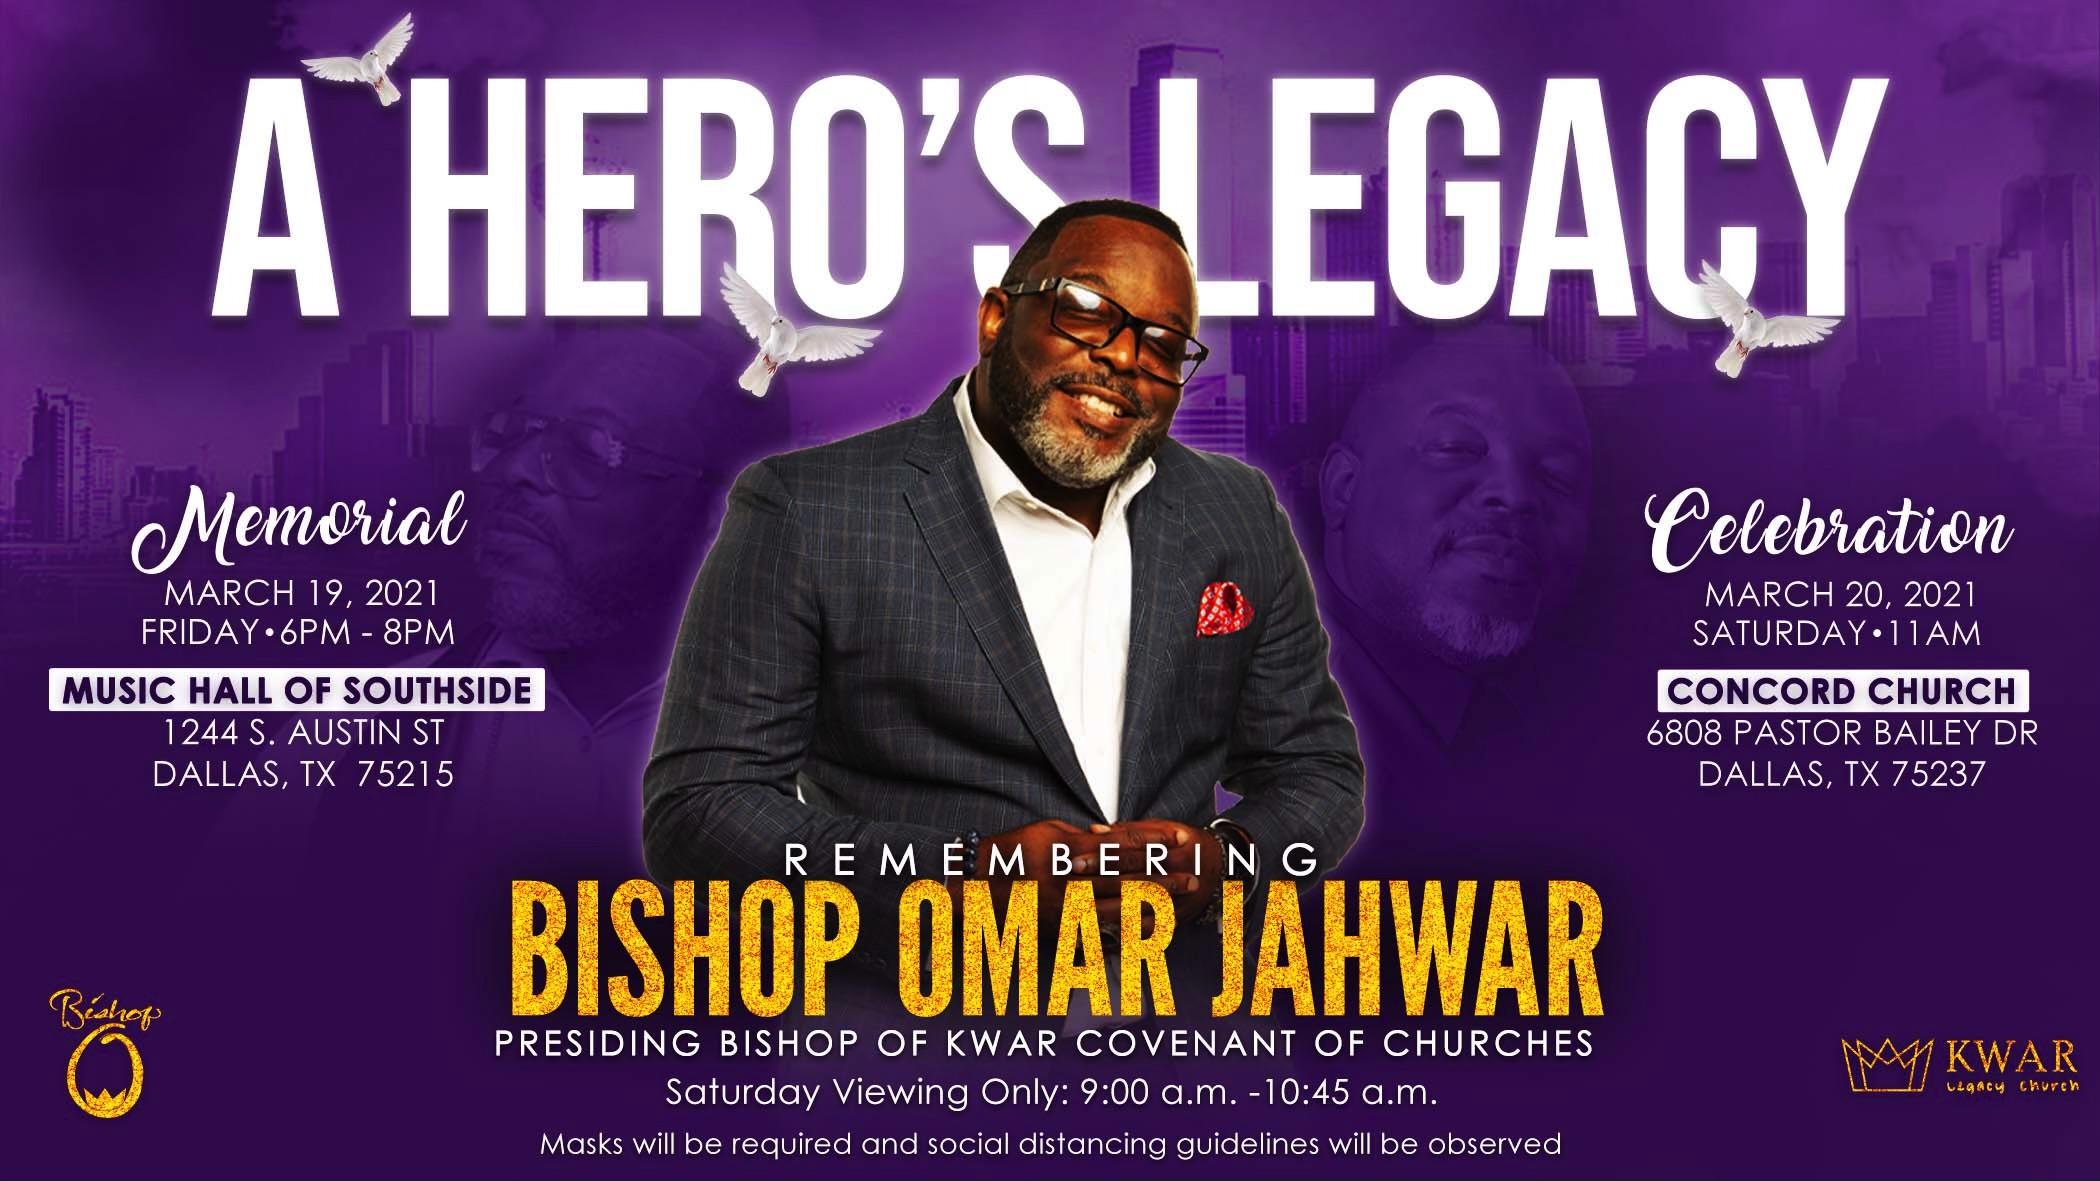 Bishop Omar Jahwar Leaves Behind a Legacy of Love and Healing of Our Communities